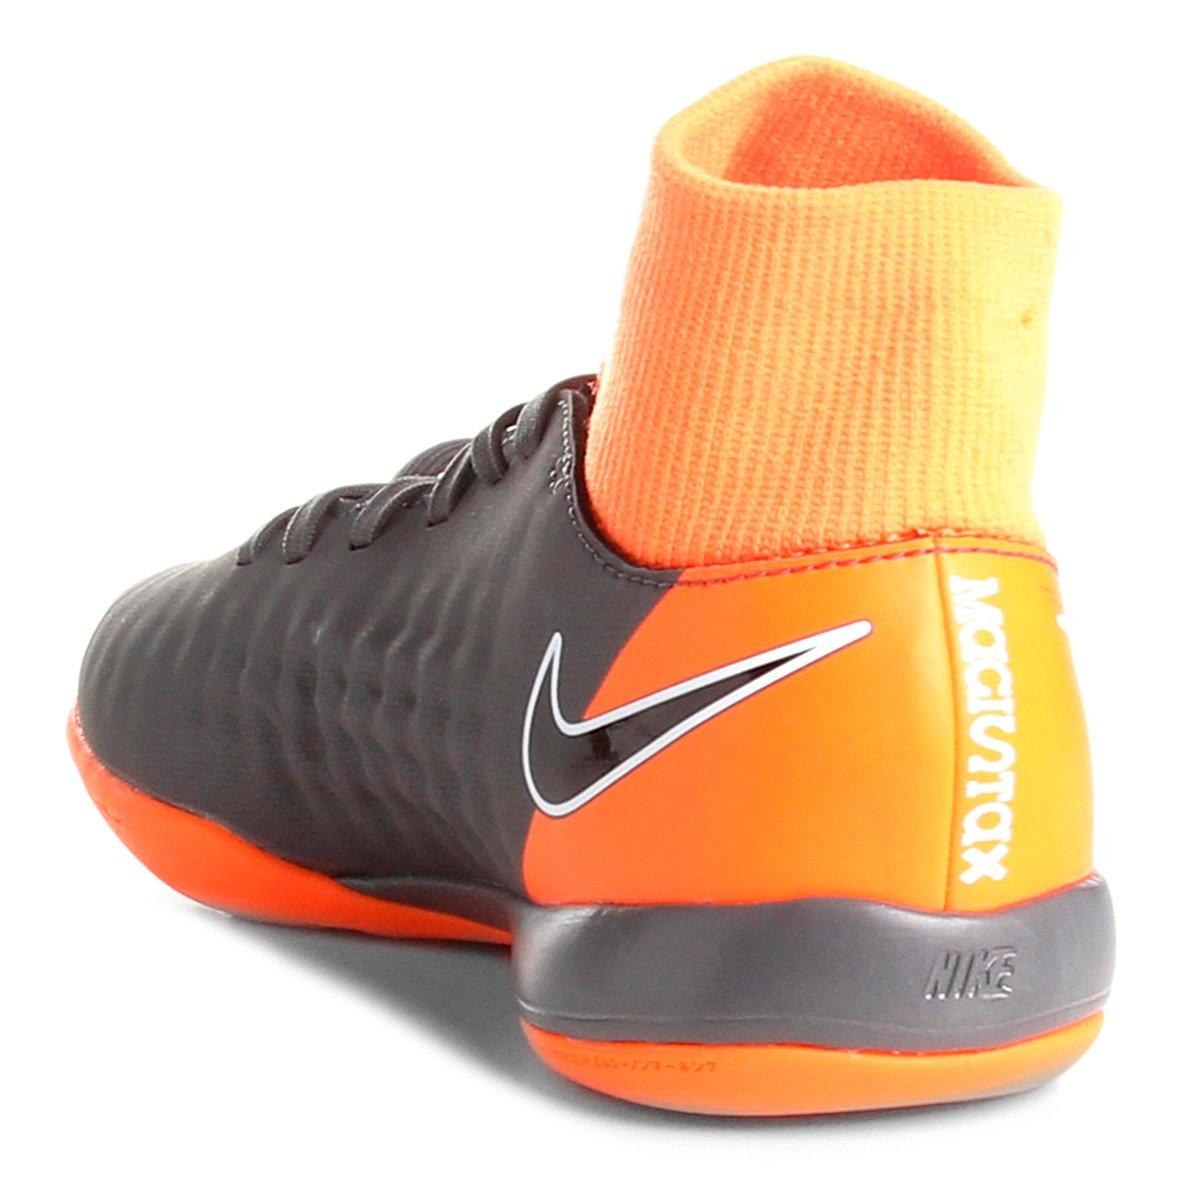 ... Chuteira Futsal Nike Magista Obra 2 Academy Dinamic Fit Infantil ... 28f03135c4cca